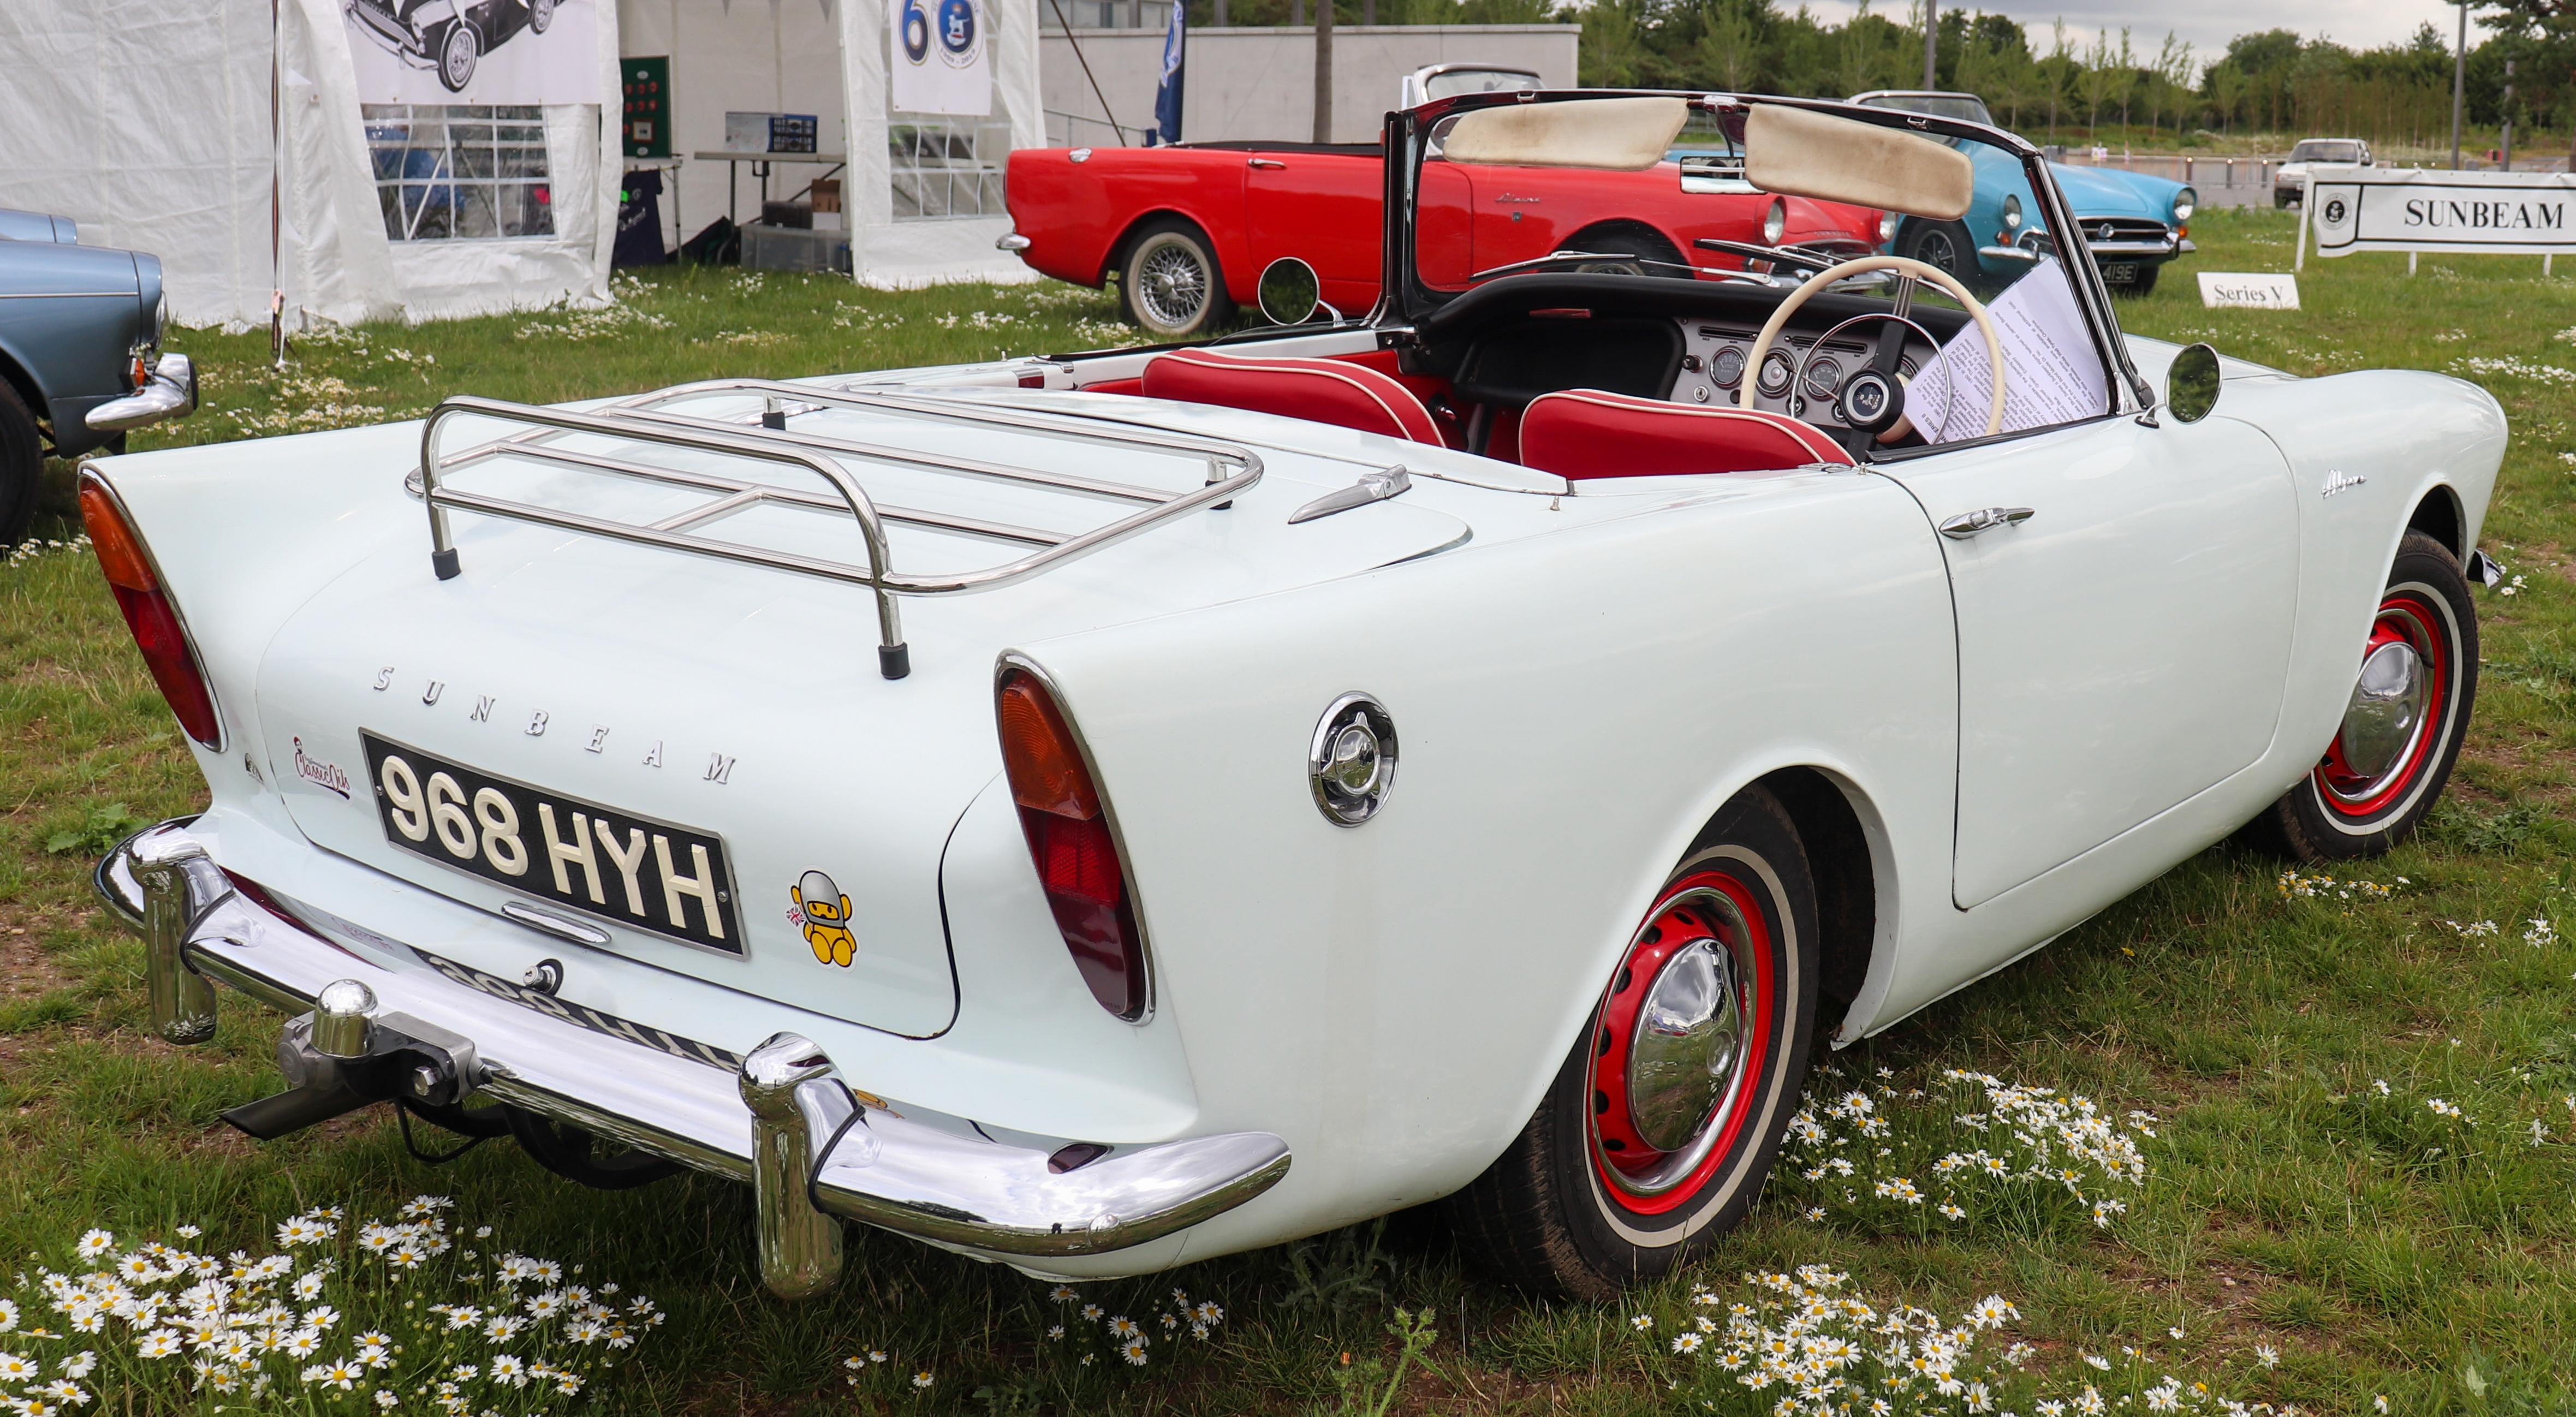 1962_Sunbeam_Alpine_Series_II_1.6_Rear.j